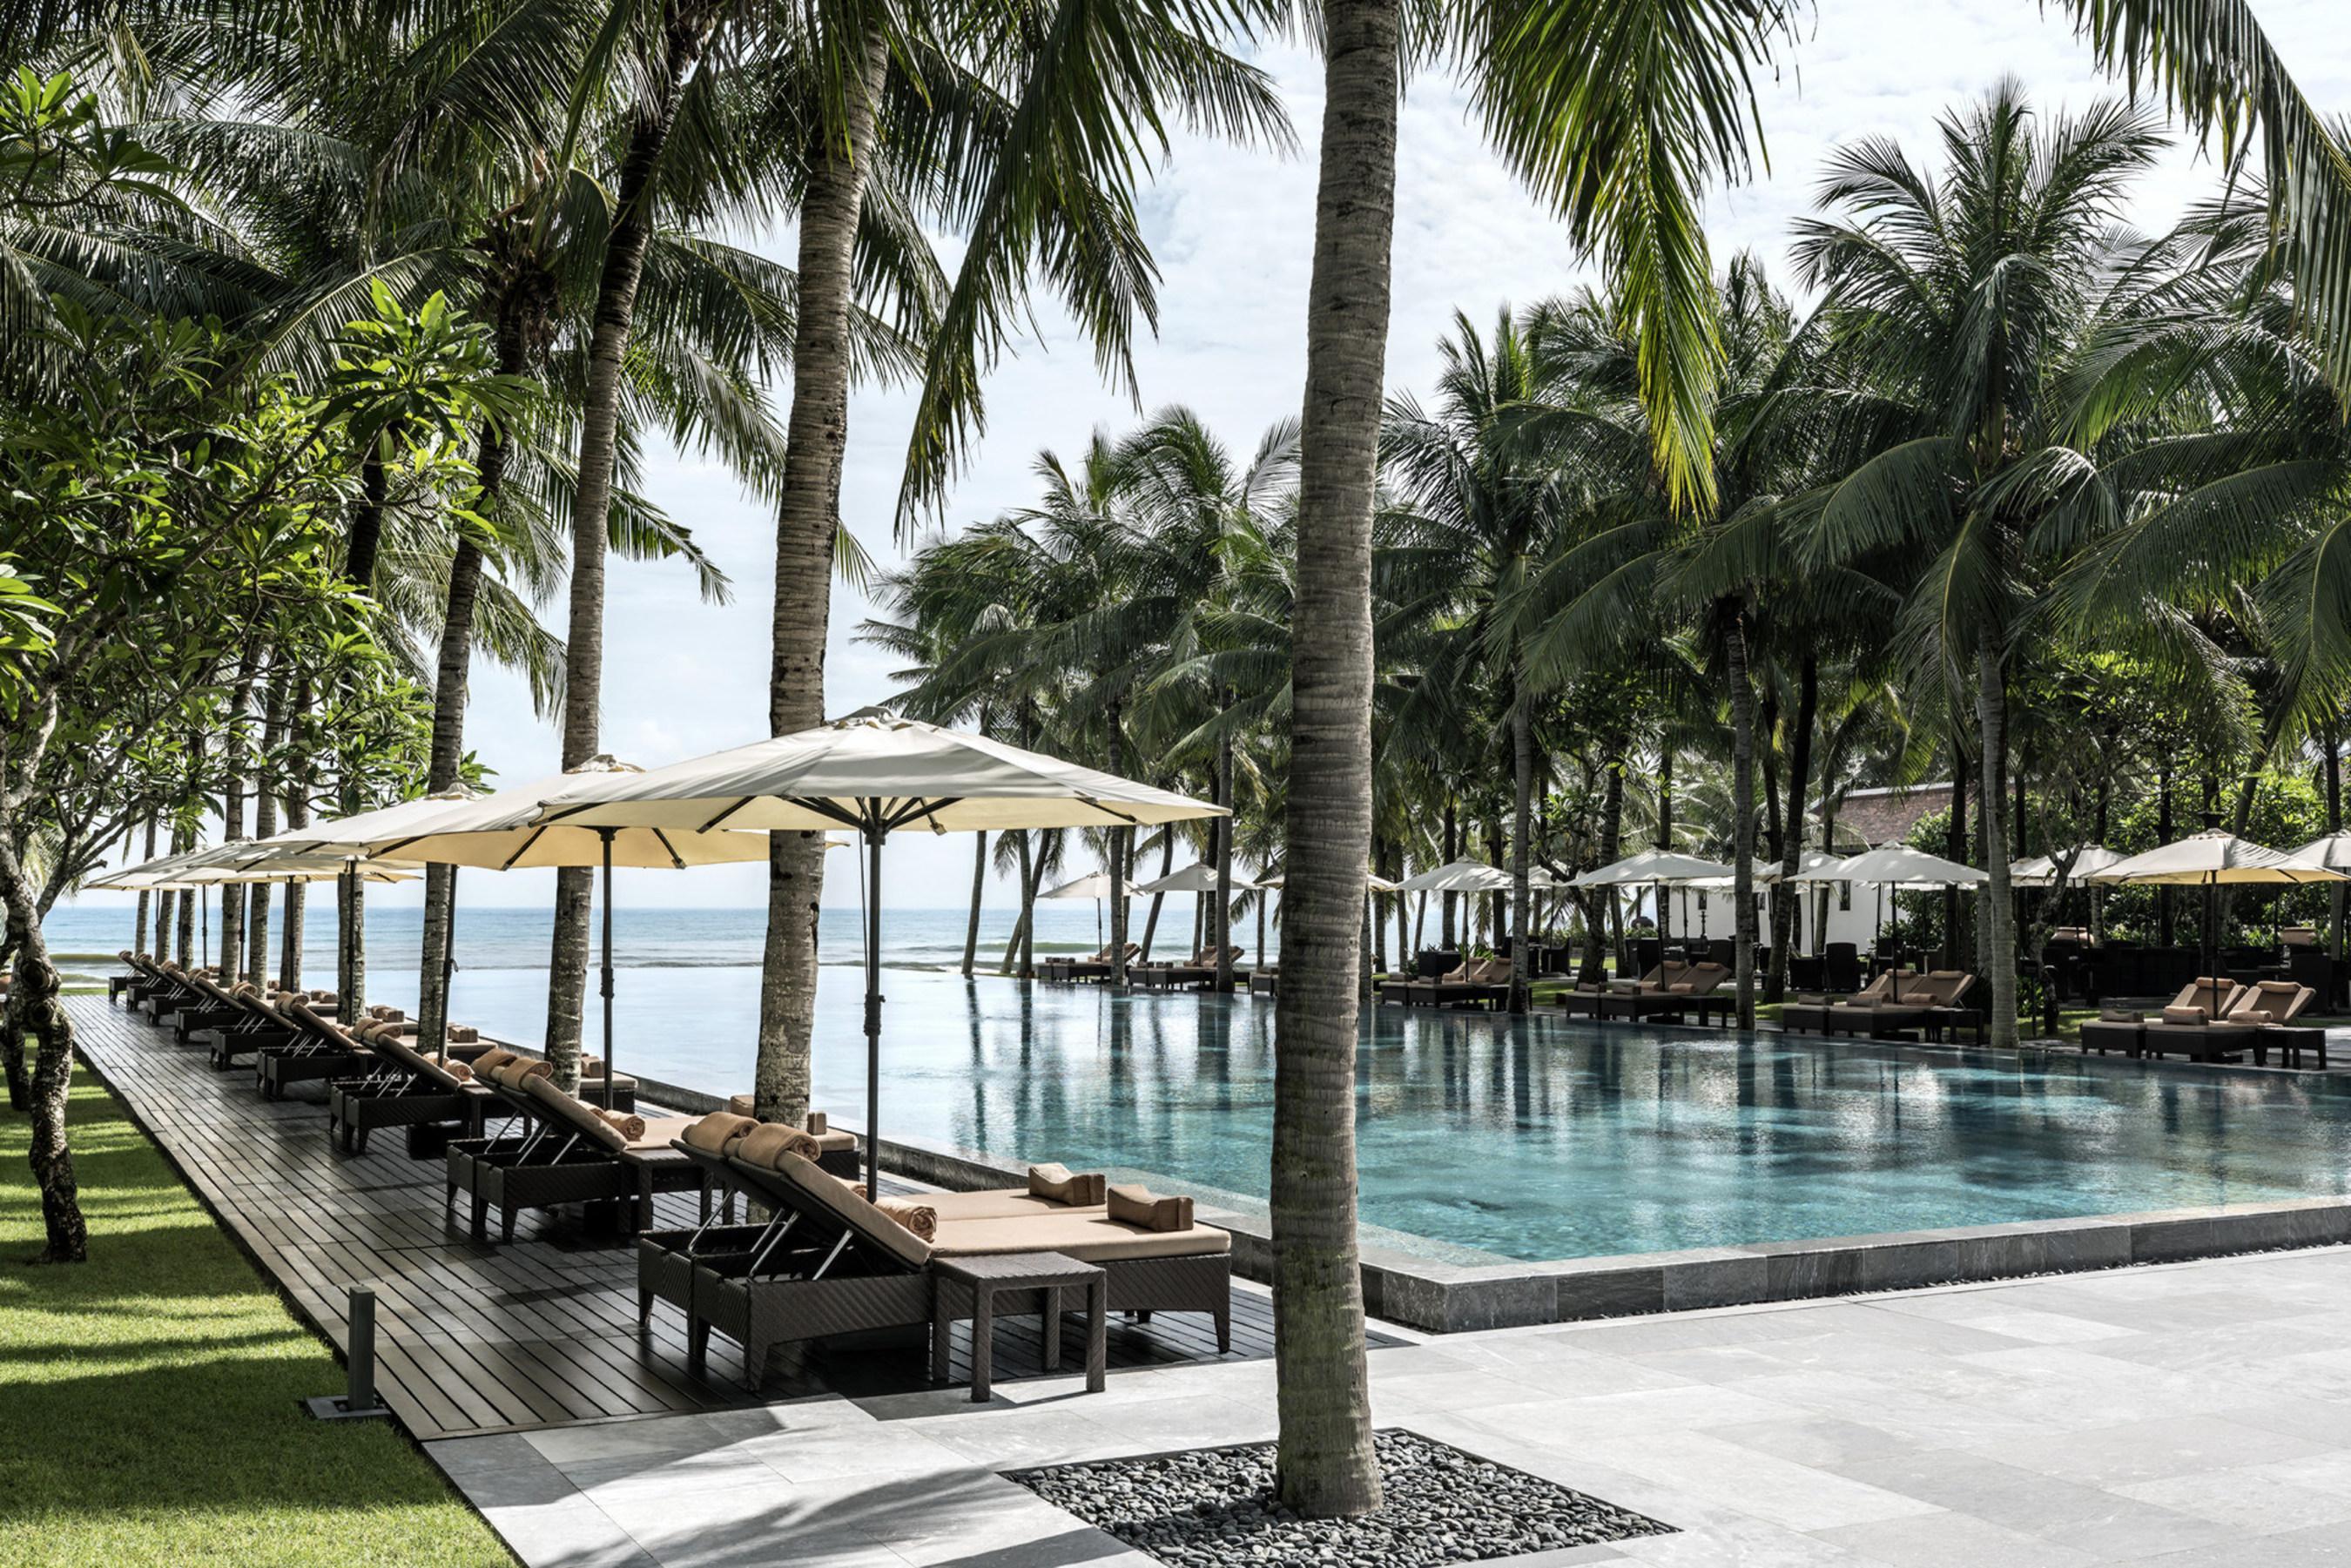 The New Four Seasons Resort The Nam Hai, Hoi An, Vietnam Debuts This December